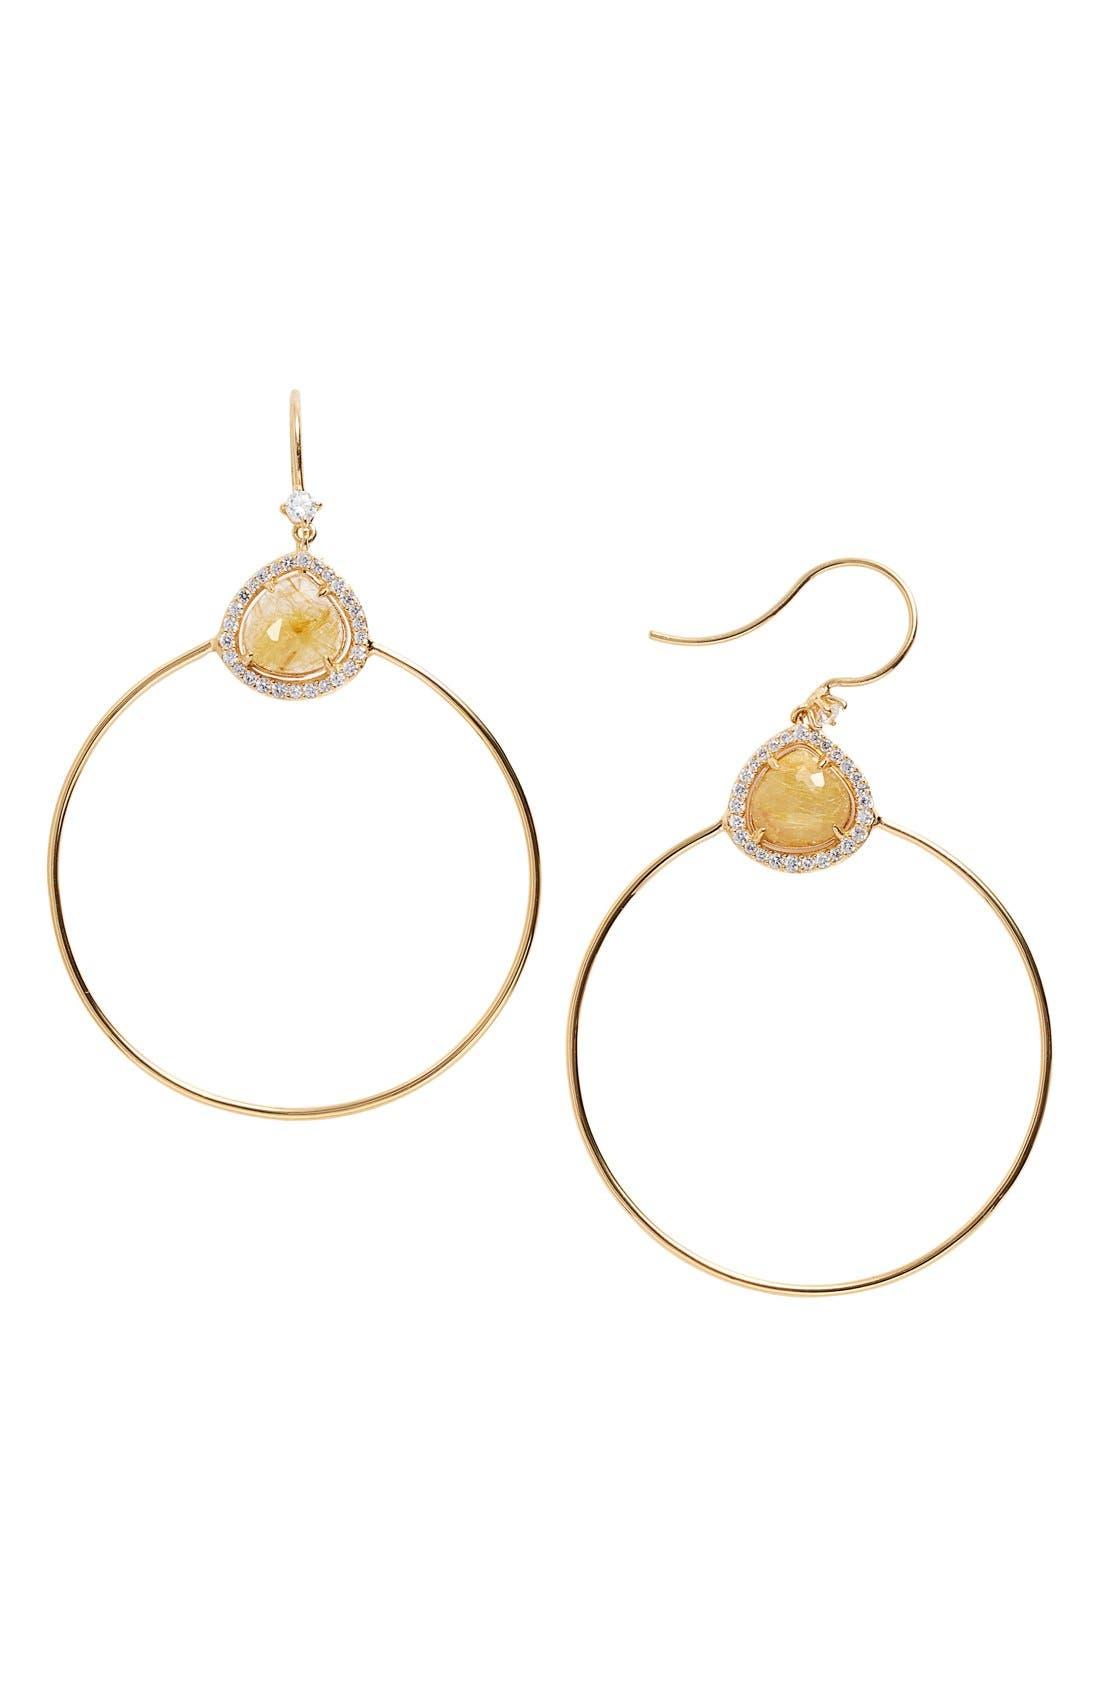 Alternate Image 1 Selected - Nadri 'Boho' Semiprecious Stone Frontal Hoop Earrings